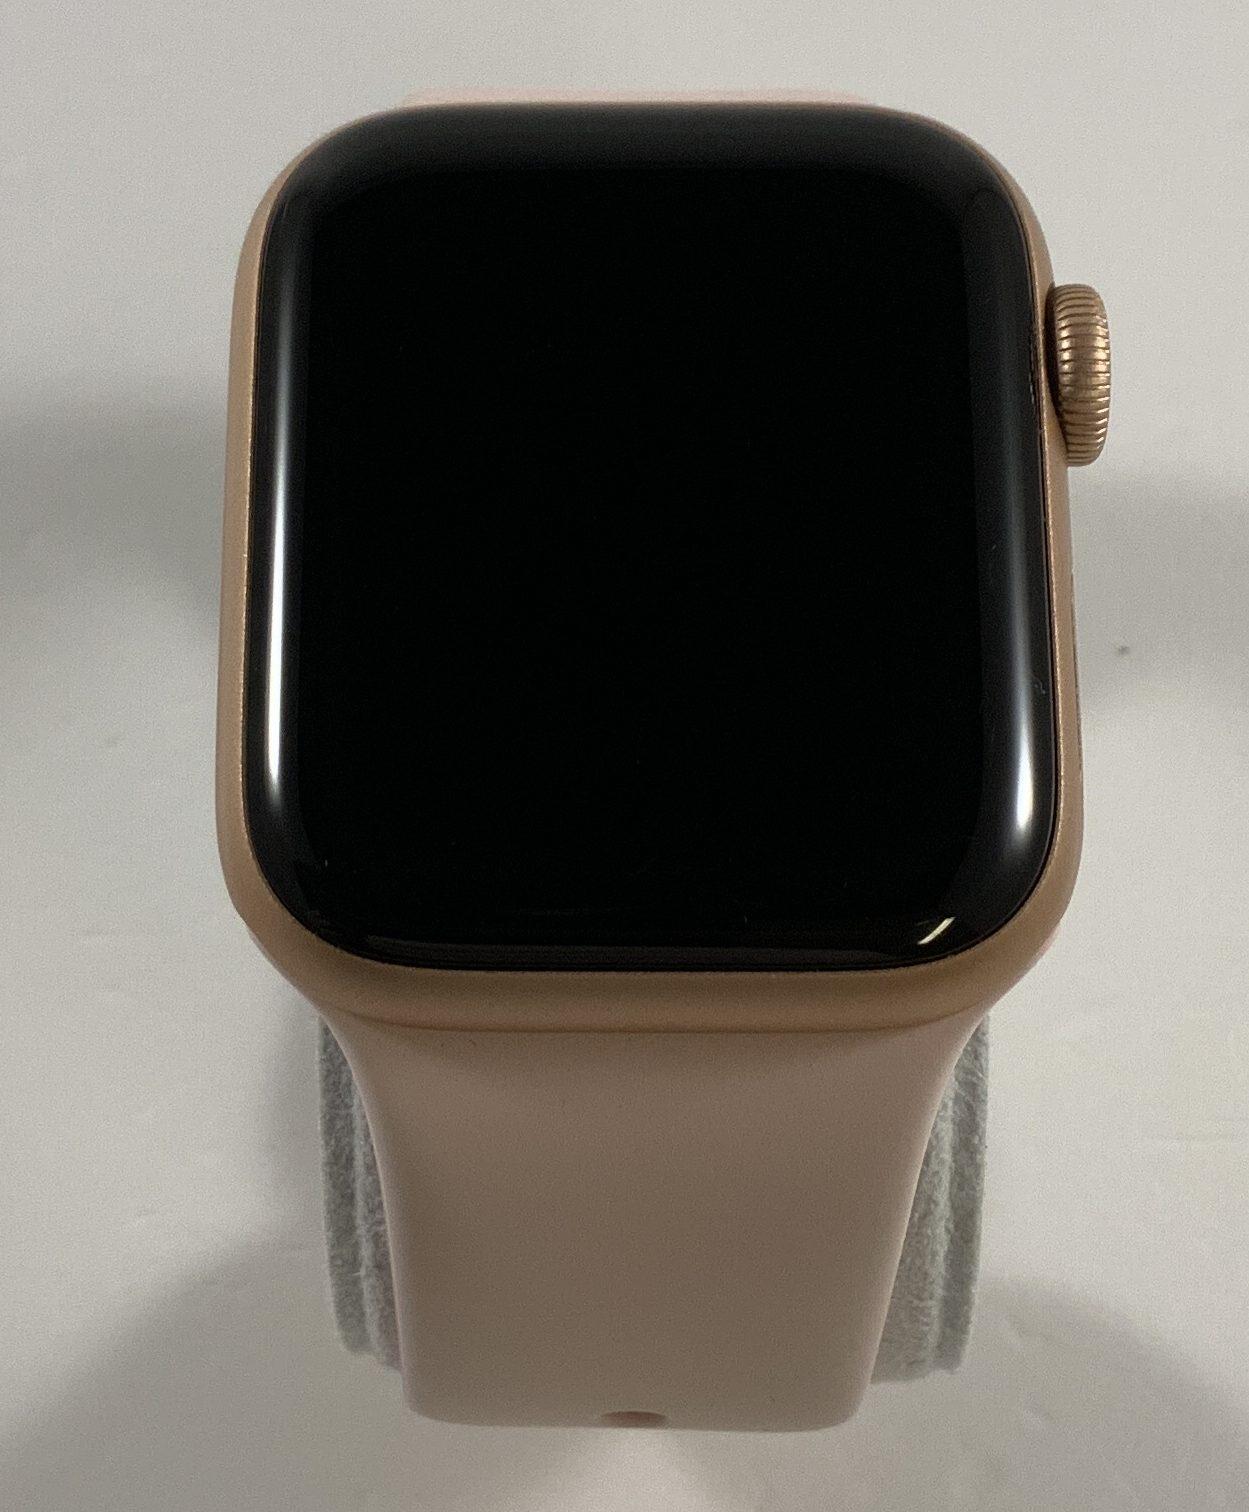 Watch Series 5 Aluminum Cellular (40mm), Gold, Afbeelding 1